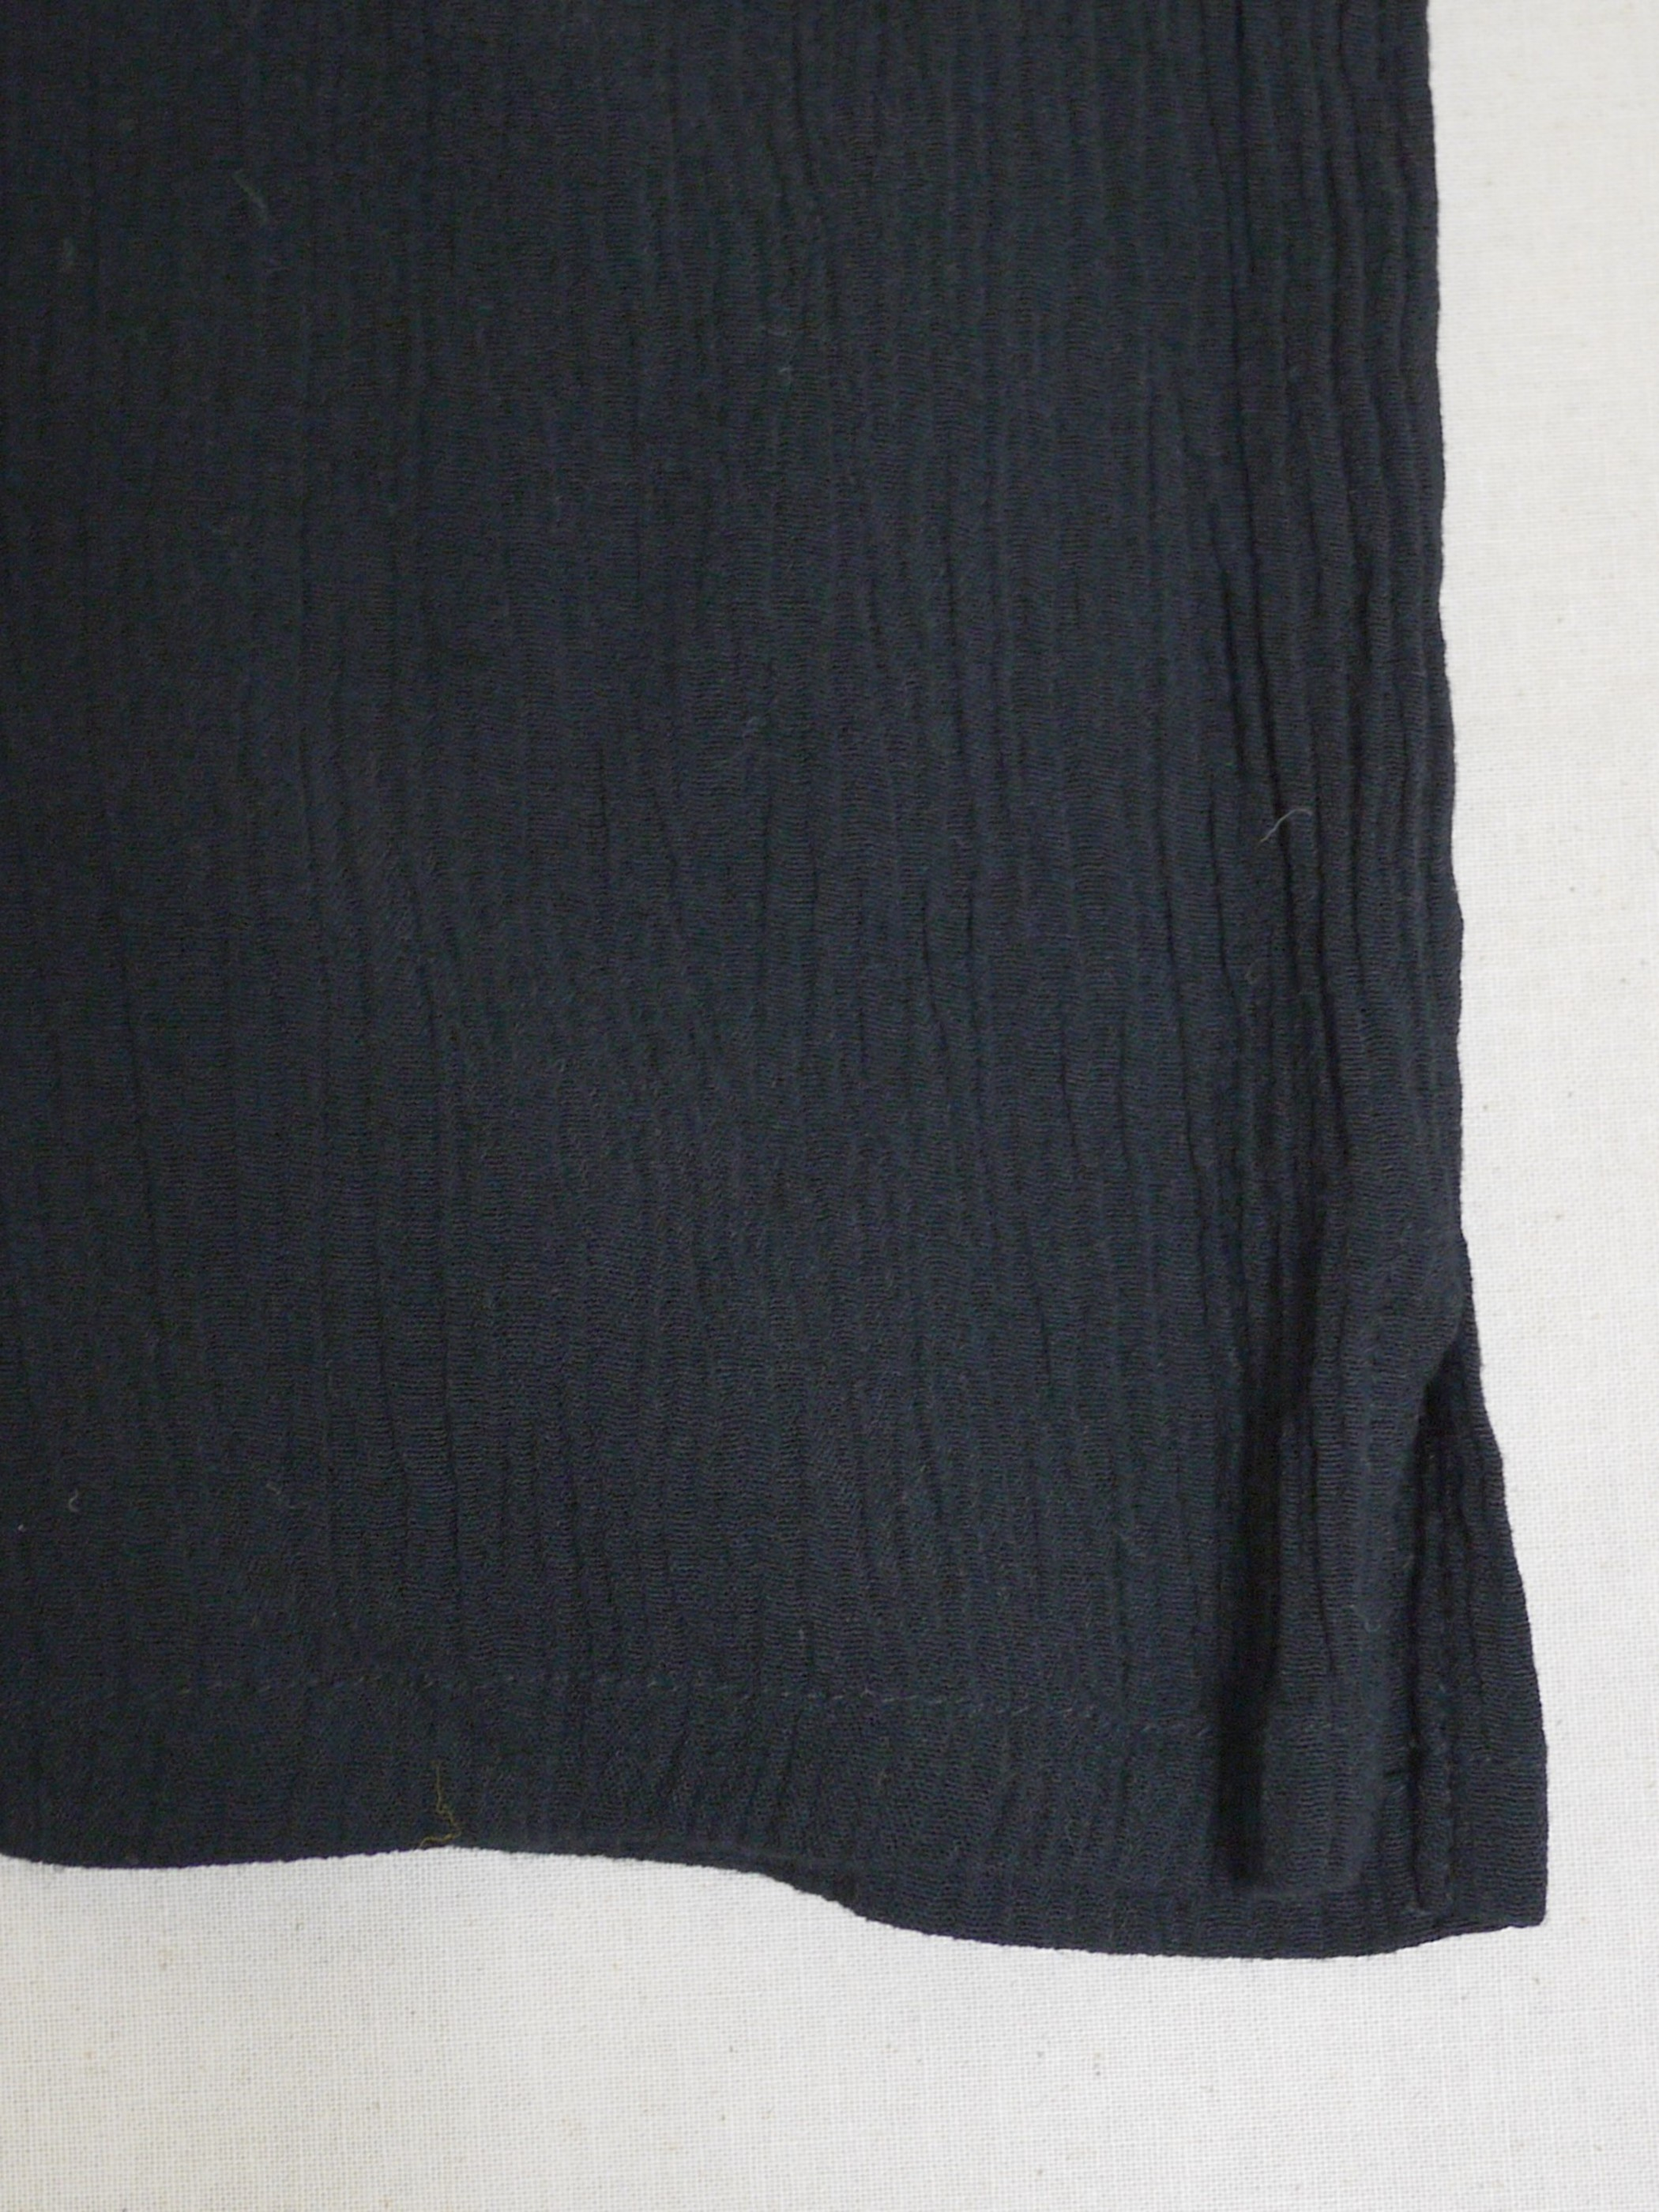 Sleeveless Tops SizeL